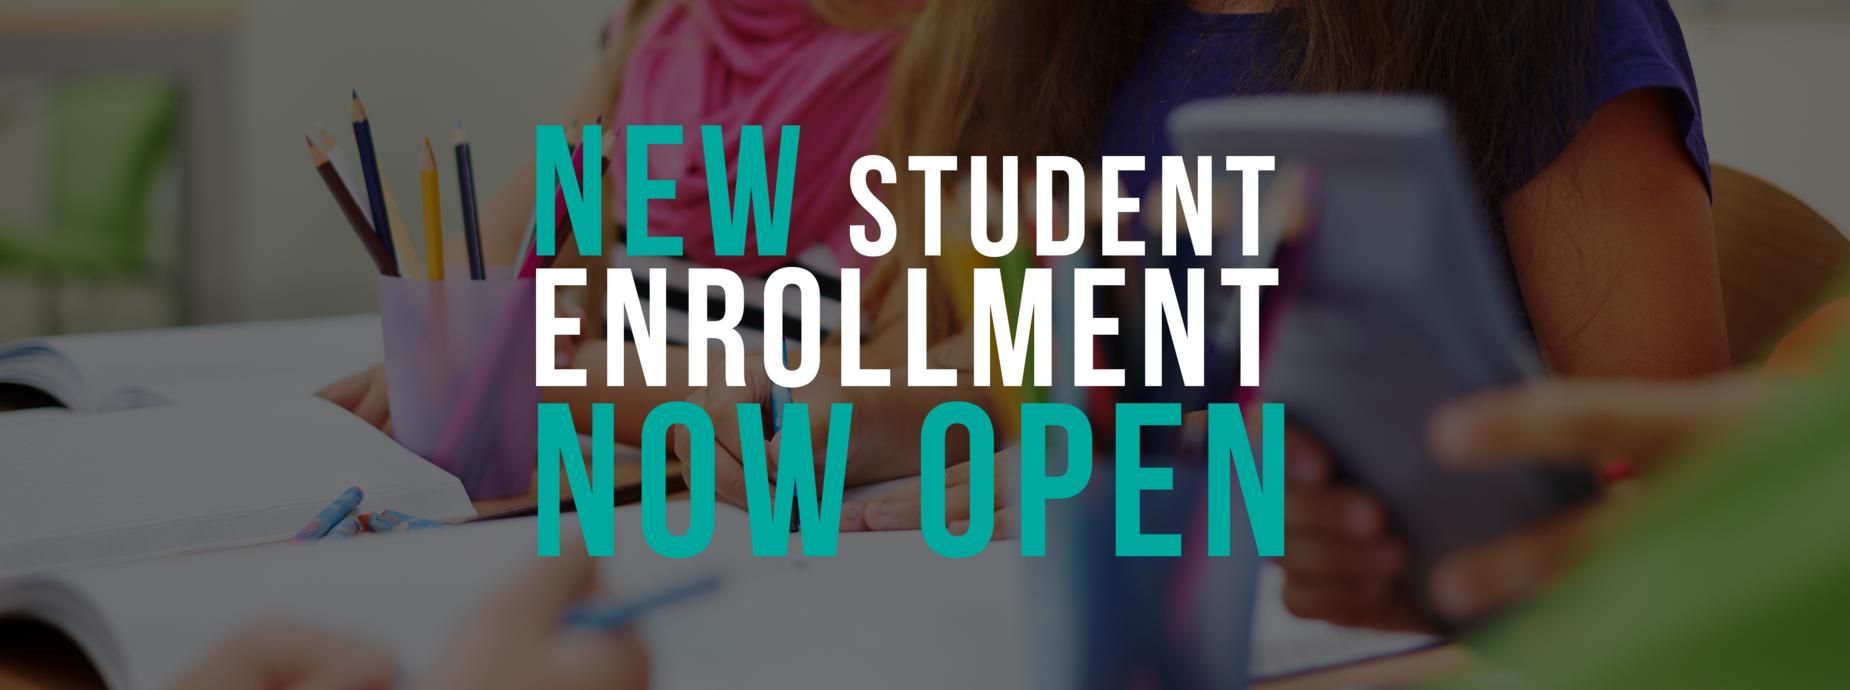 New Student Enrollment Now Open Banner